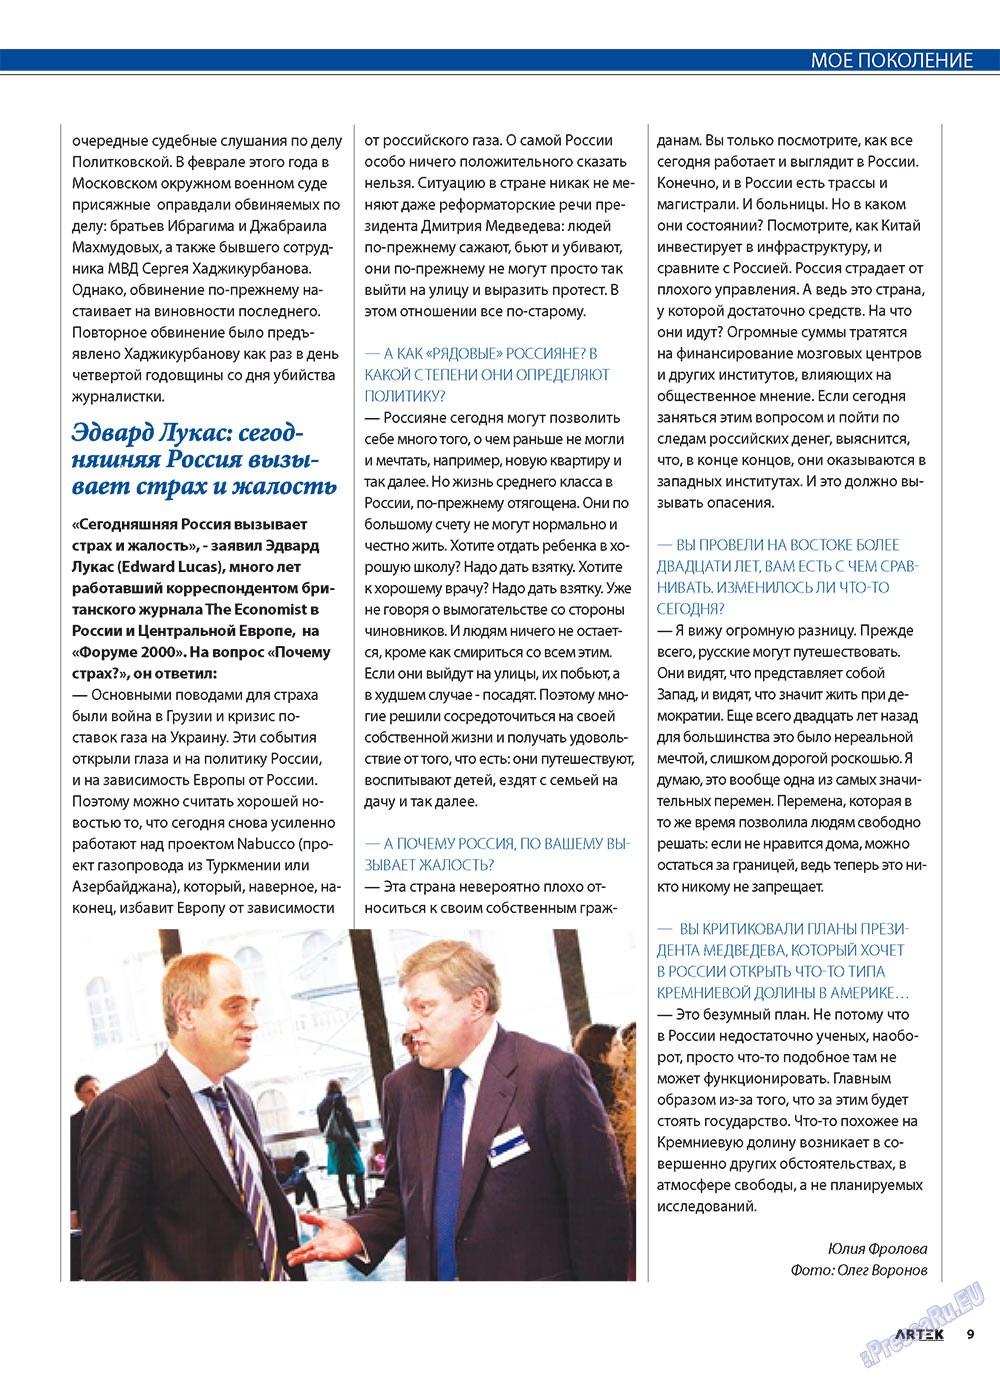 Артек (журнал). 2010 год, номер 5, стр. 11